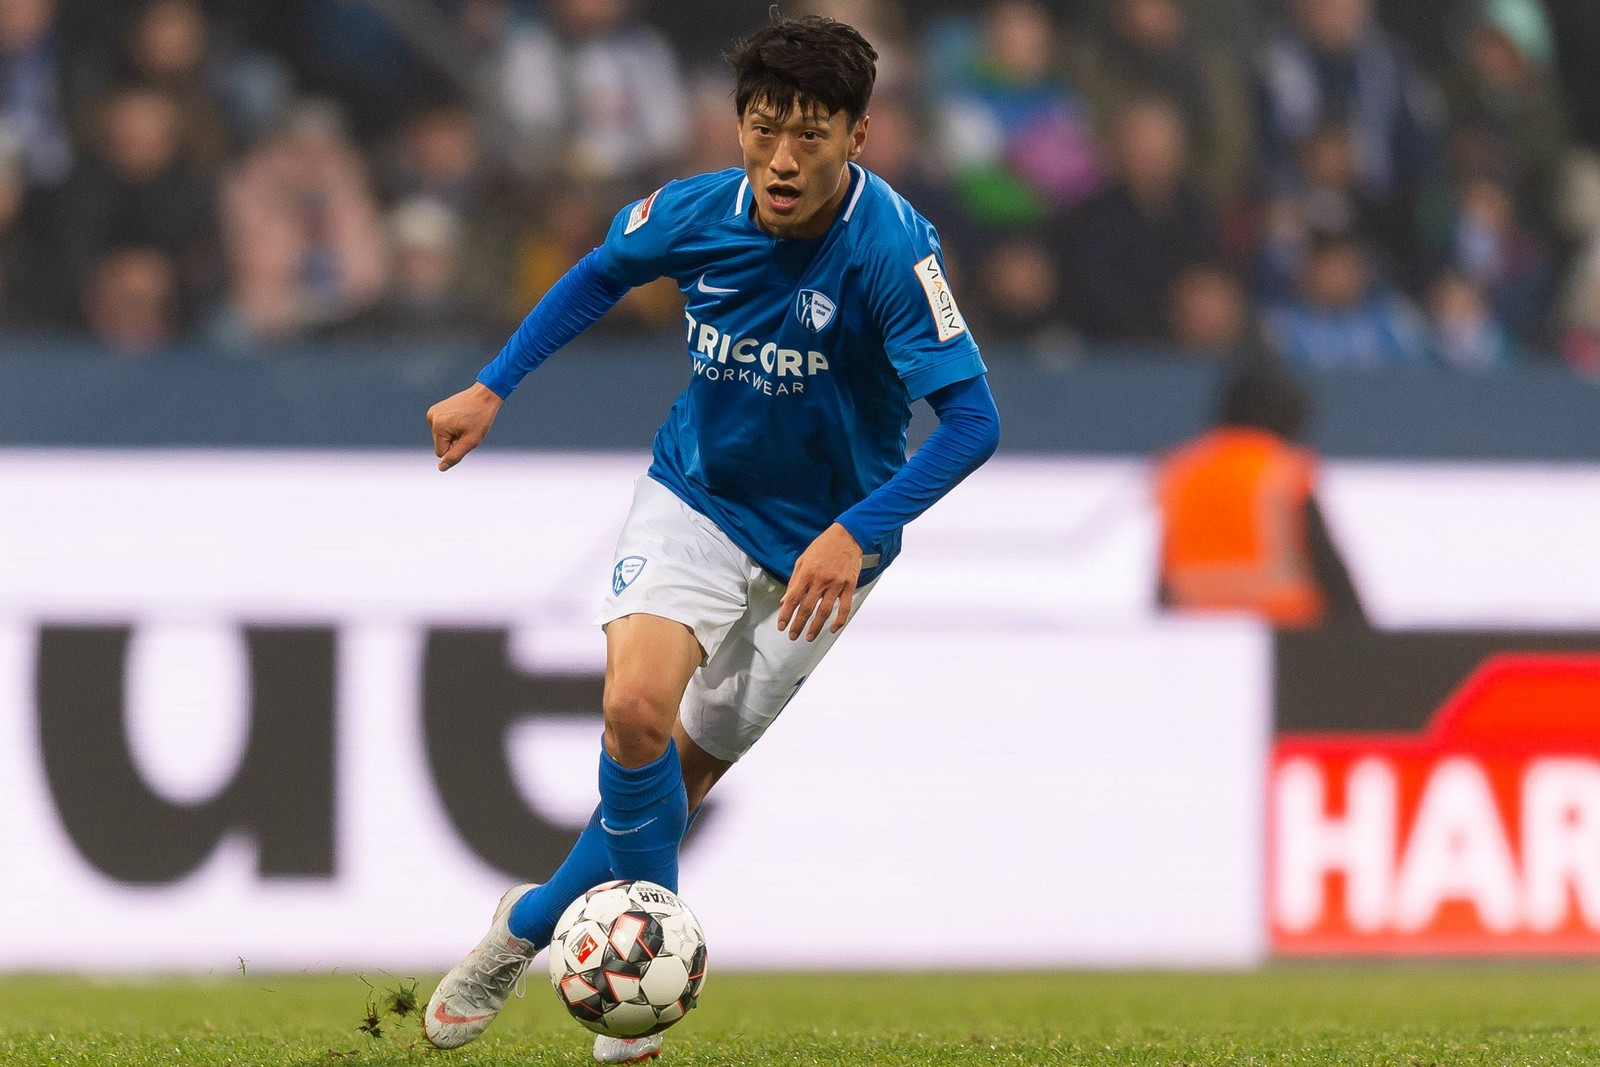 Chung Yong Lee vom VfL Bochum